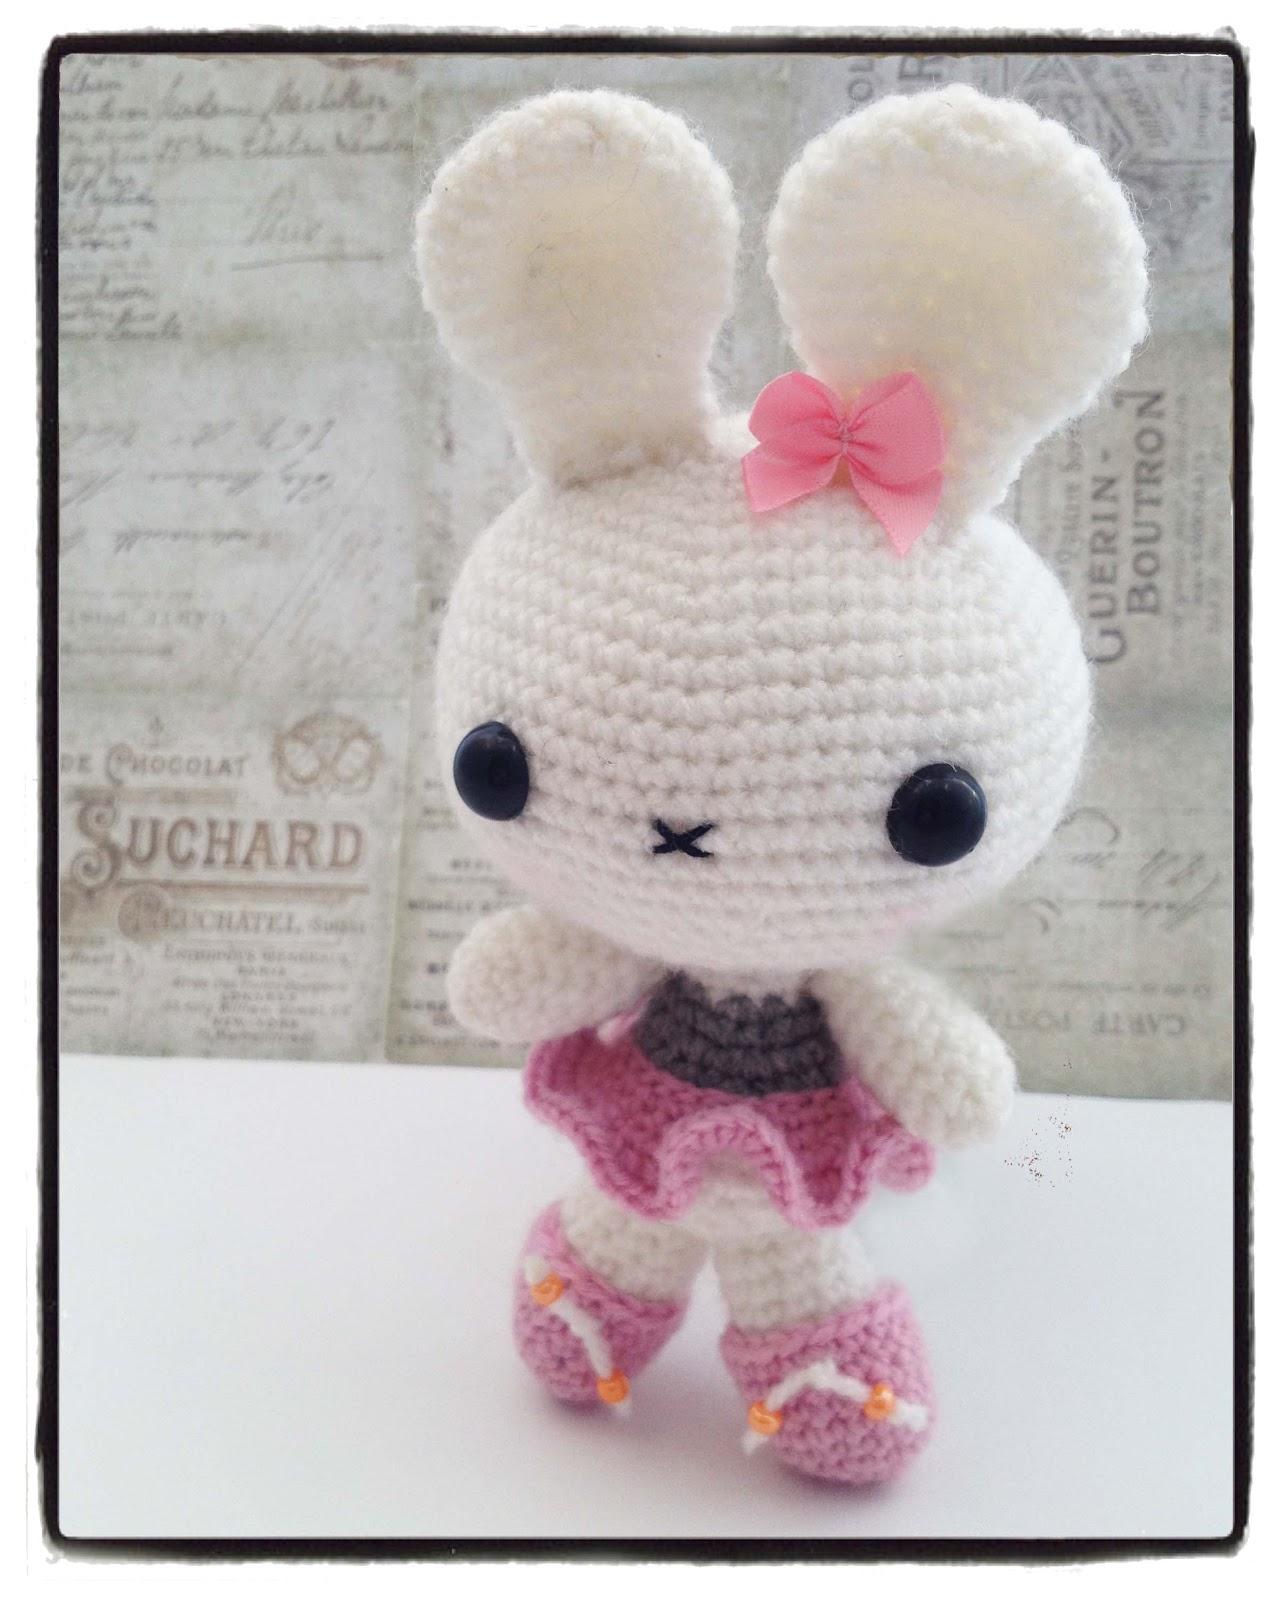 Crochet Amigurumi Blogs : Amigurumi Bunny - Kit and Clowder Online Colouring Classes